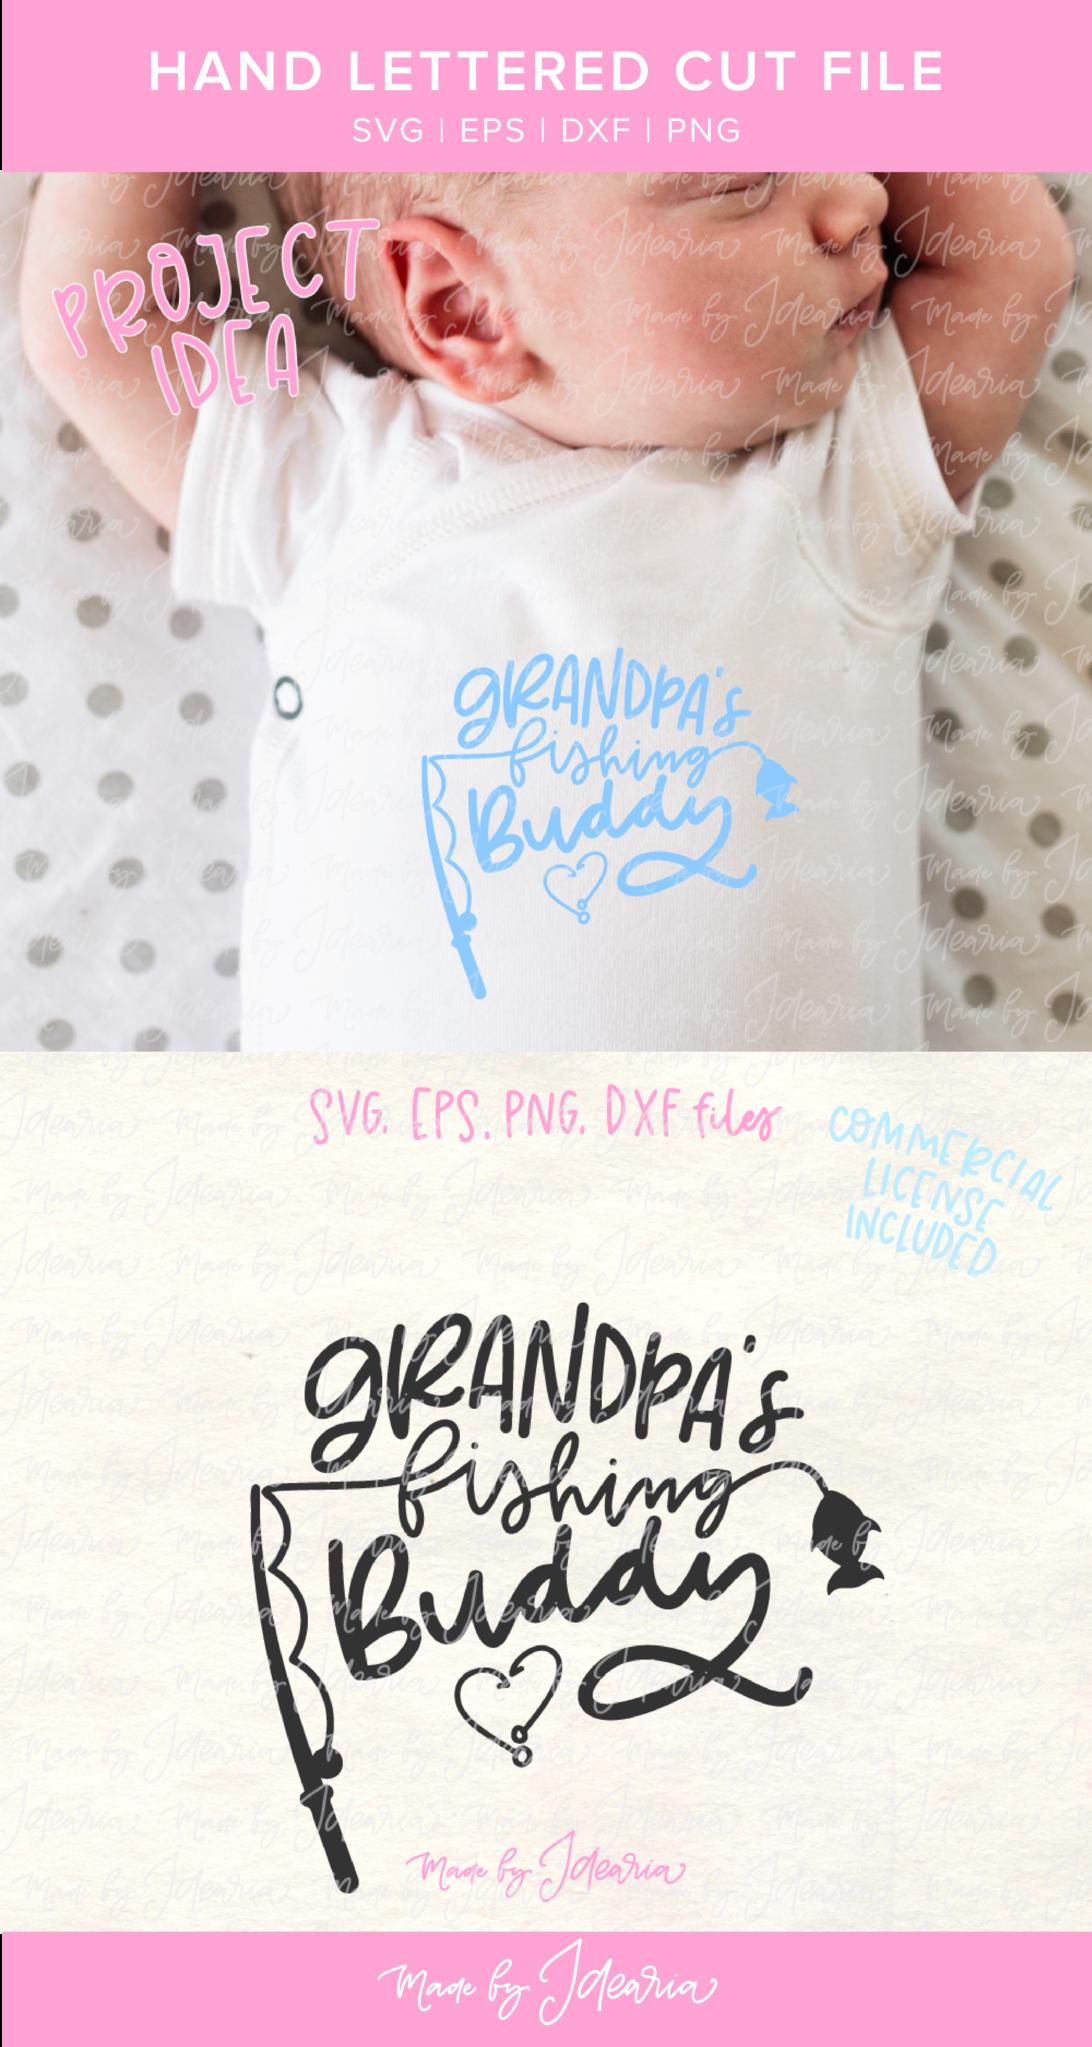 Download Grandpa S Fishing Buddy Svg File Featuring A Fishing Pole And A Fish Makes A Cute Design For Grand Monogram Fishing Shirt Fishing Shirt Ideas Monogram T Shirts